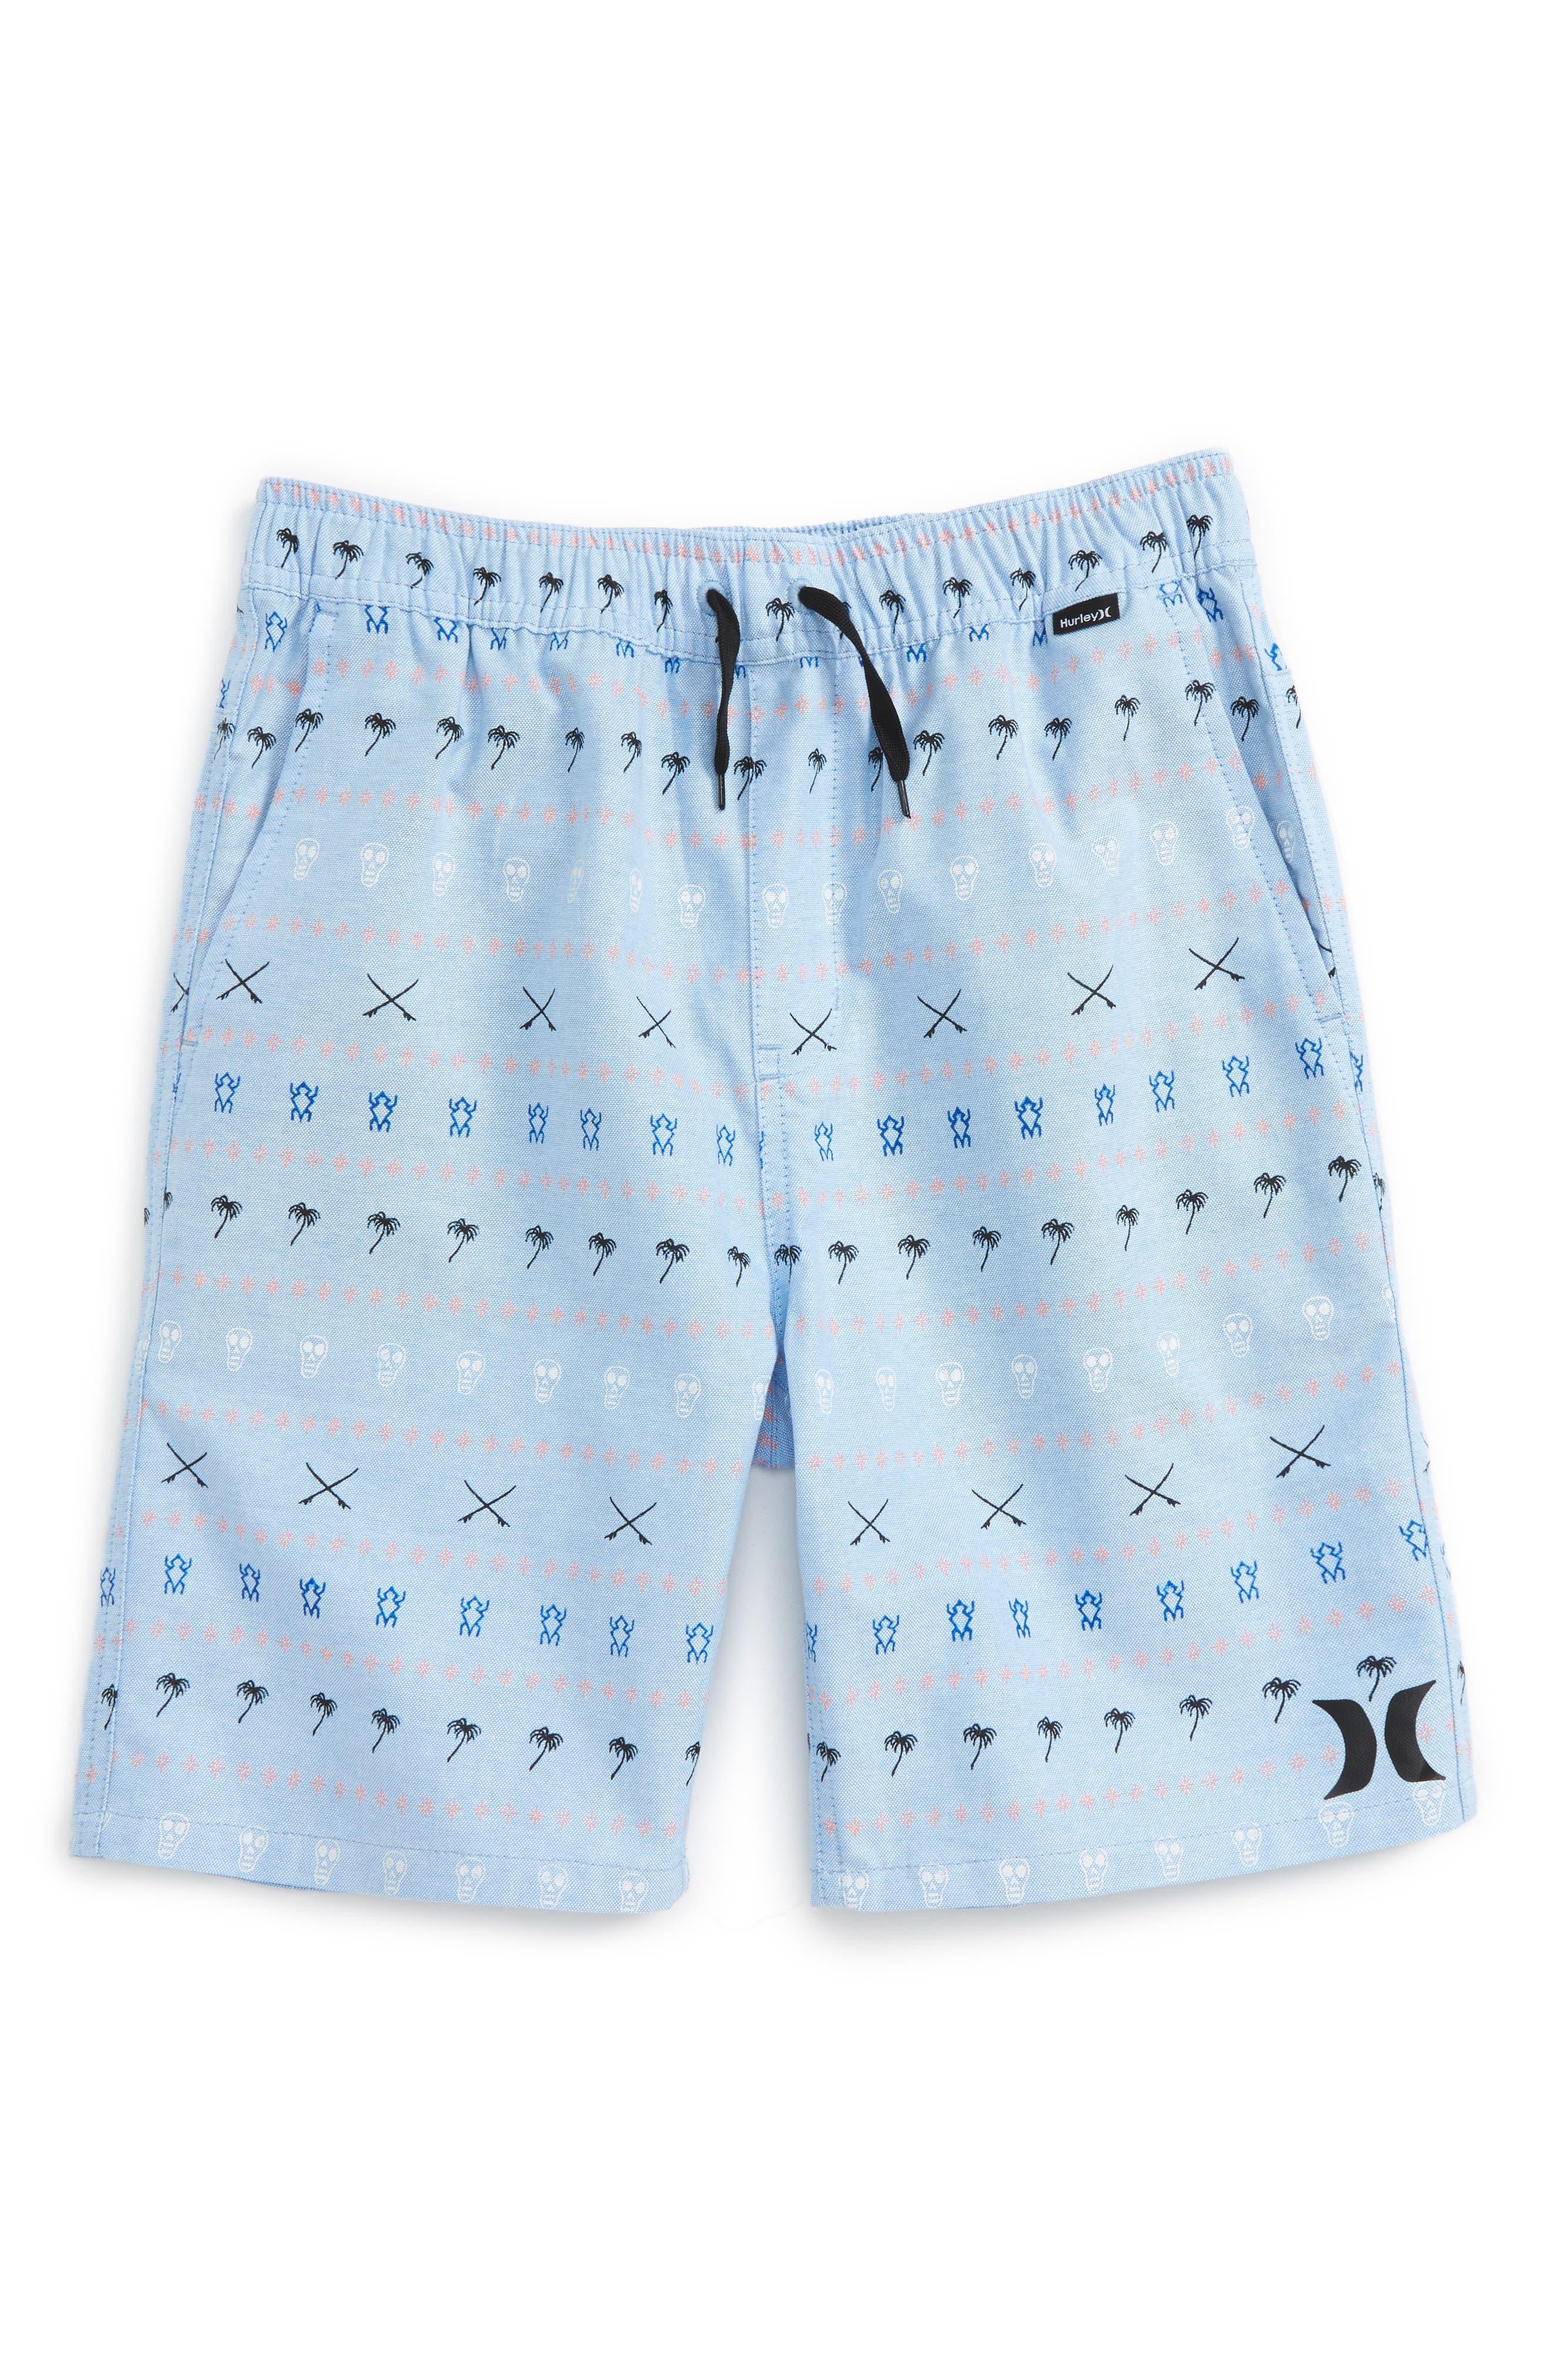 Hurley Print Shorts (Big Boys)